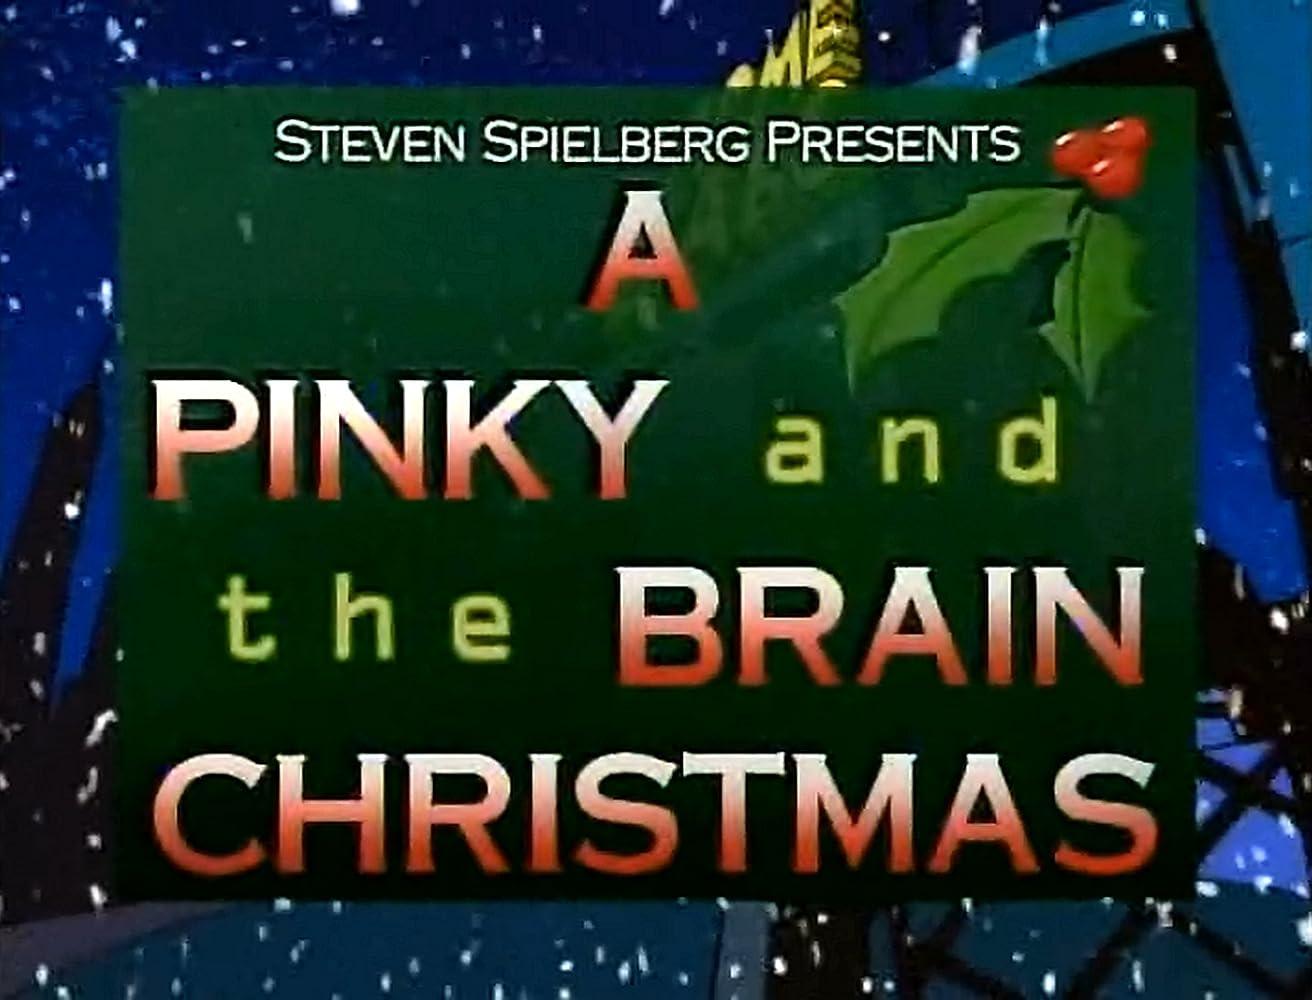 Pinky And The Brain Christmas.A Pinky The Brain Christmas 1995